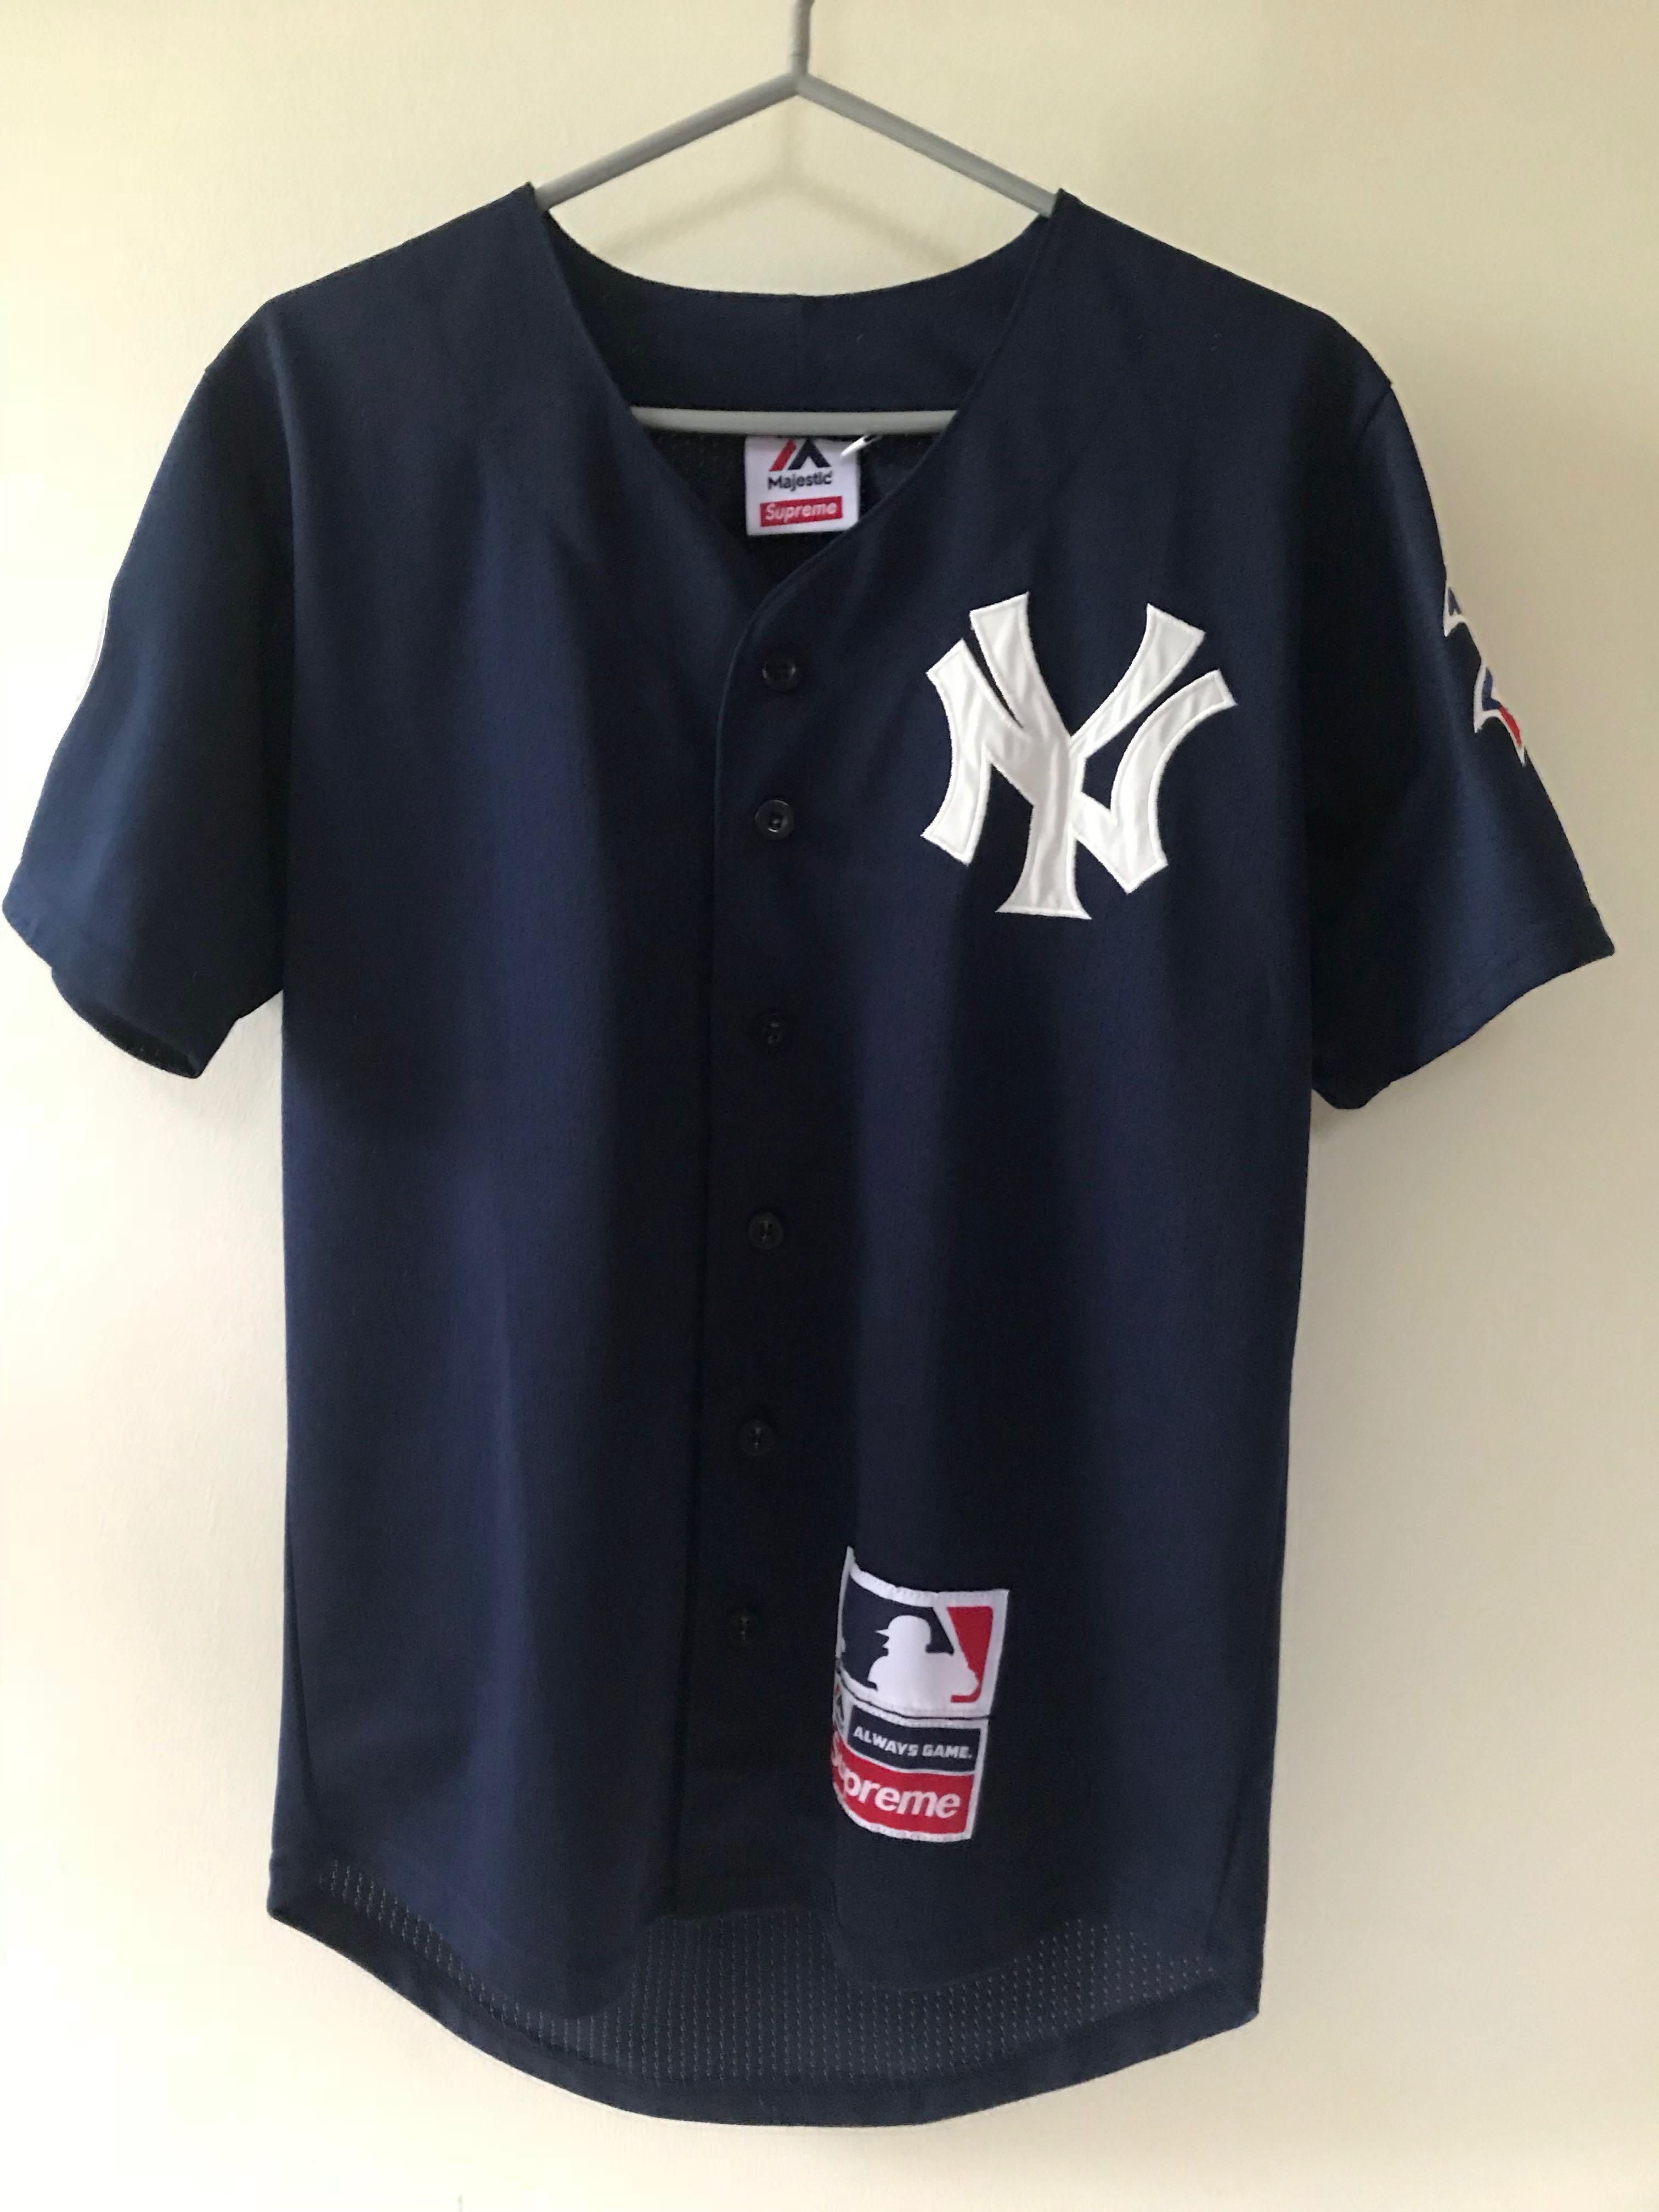 the best attitude 2eecd 5caba Majestic x Supreme NY Yankees Baseball Jersey